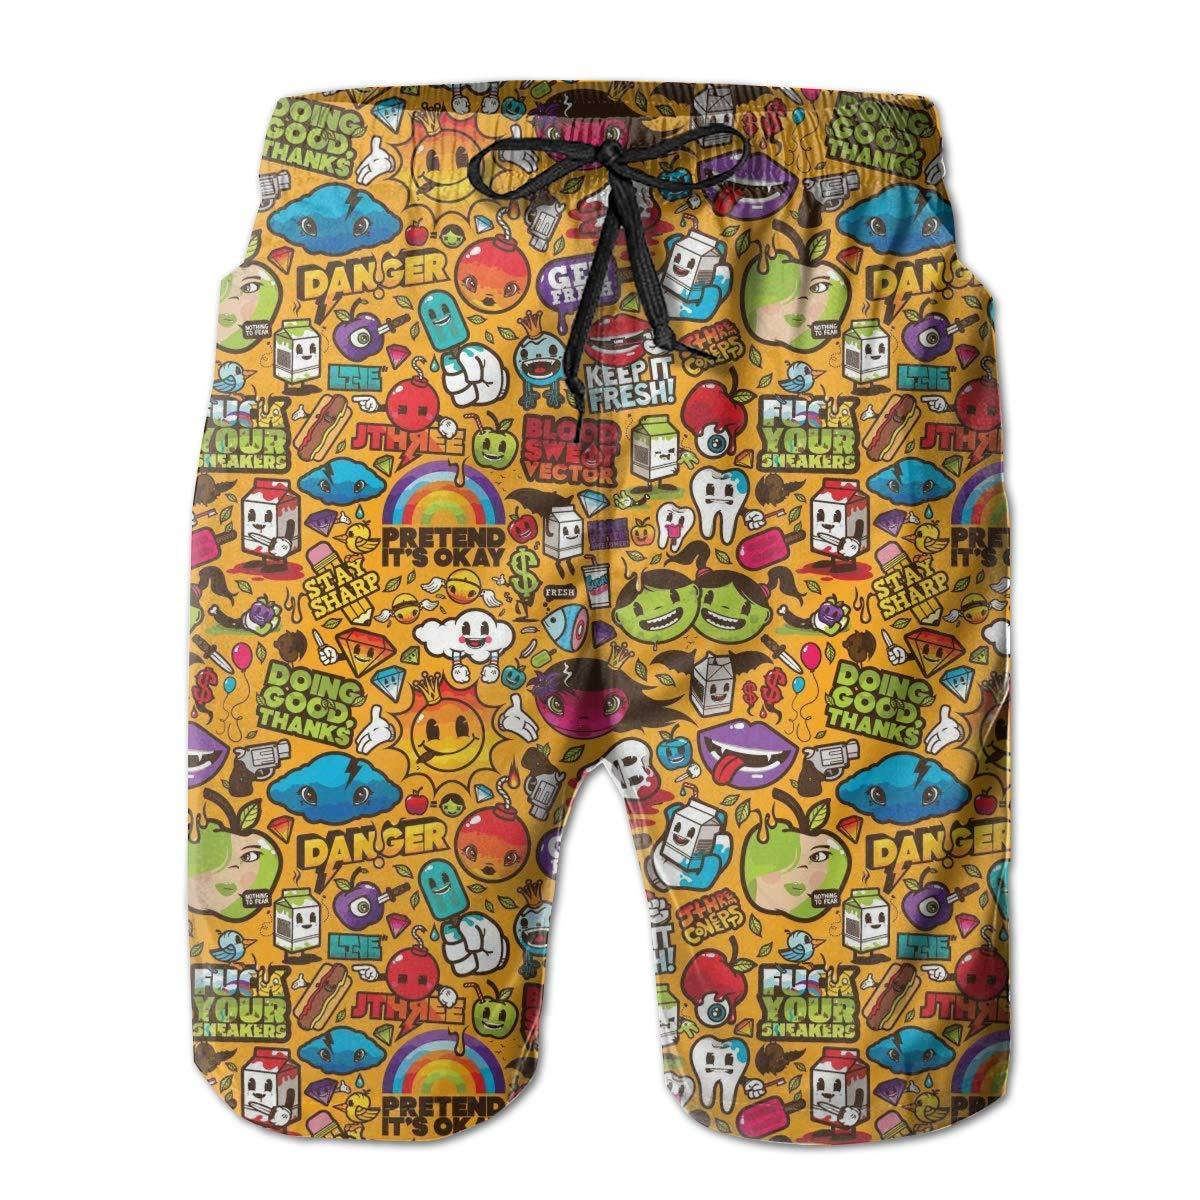 MOBEITI Comfort Mens Big /&Tall Swim Trunks Board Shorts for Beach Gym Workout,